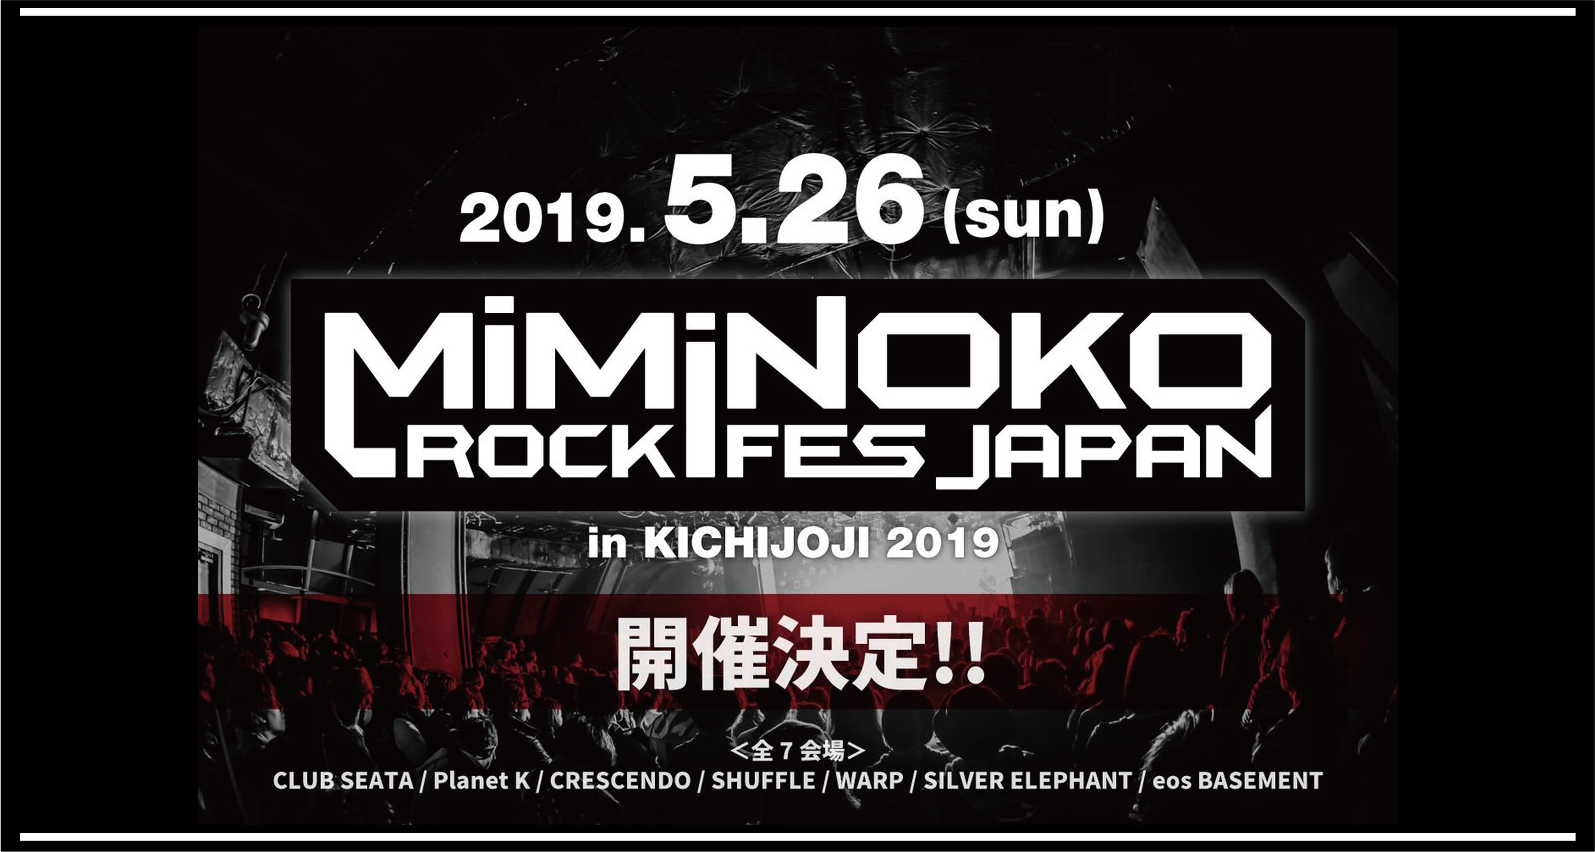 MiMiNOKOROCK FES JAPAN in 吉祥寺 2019